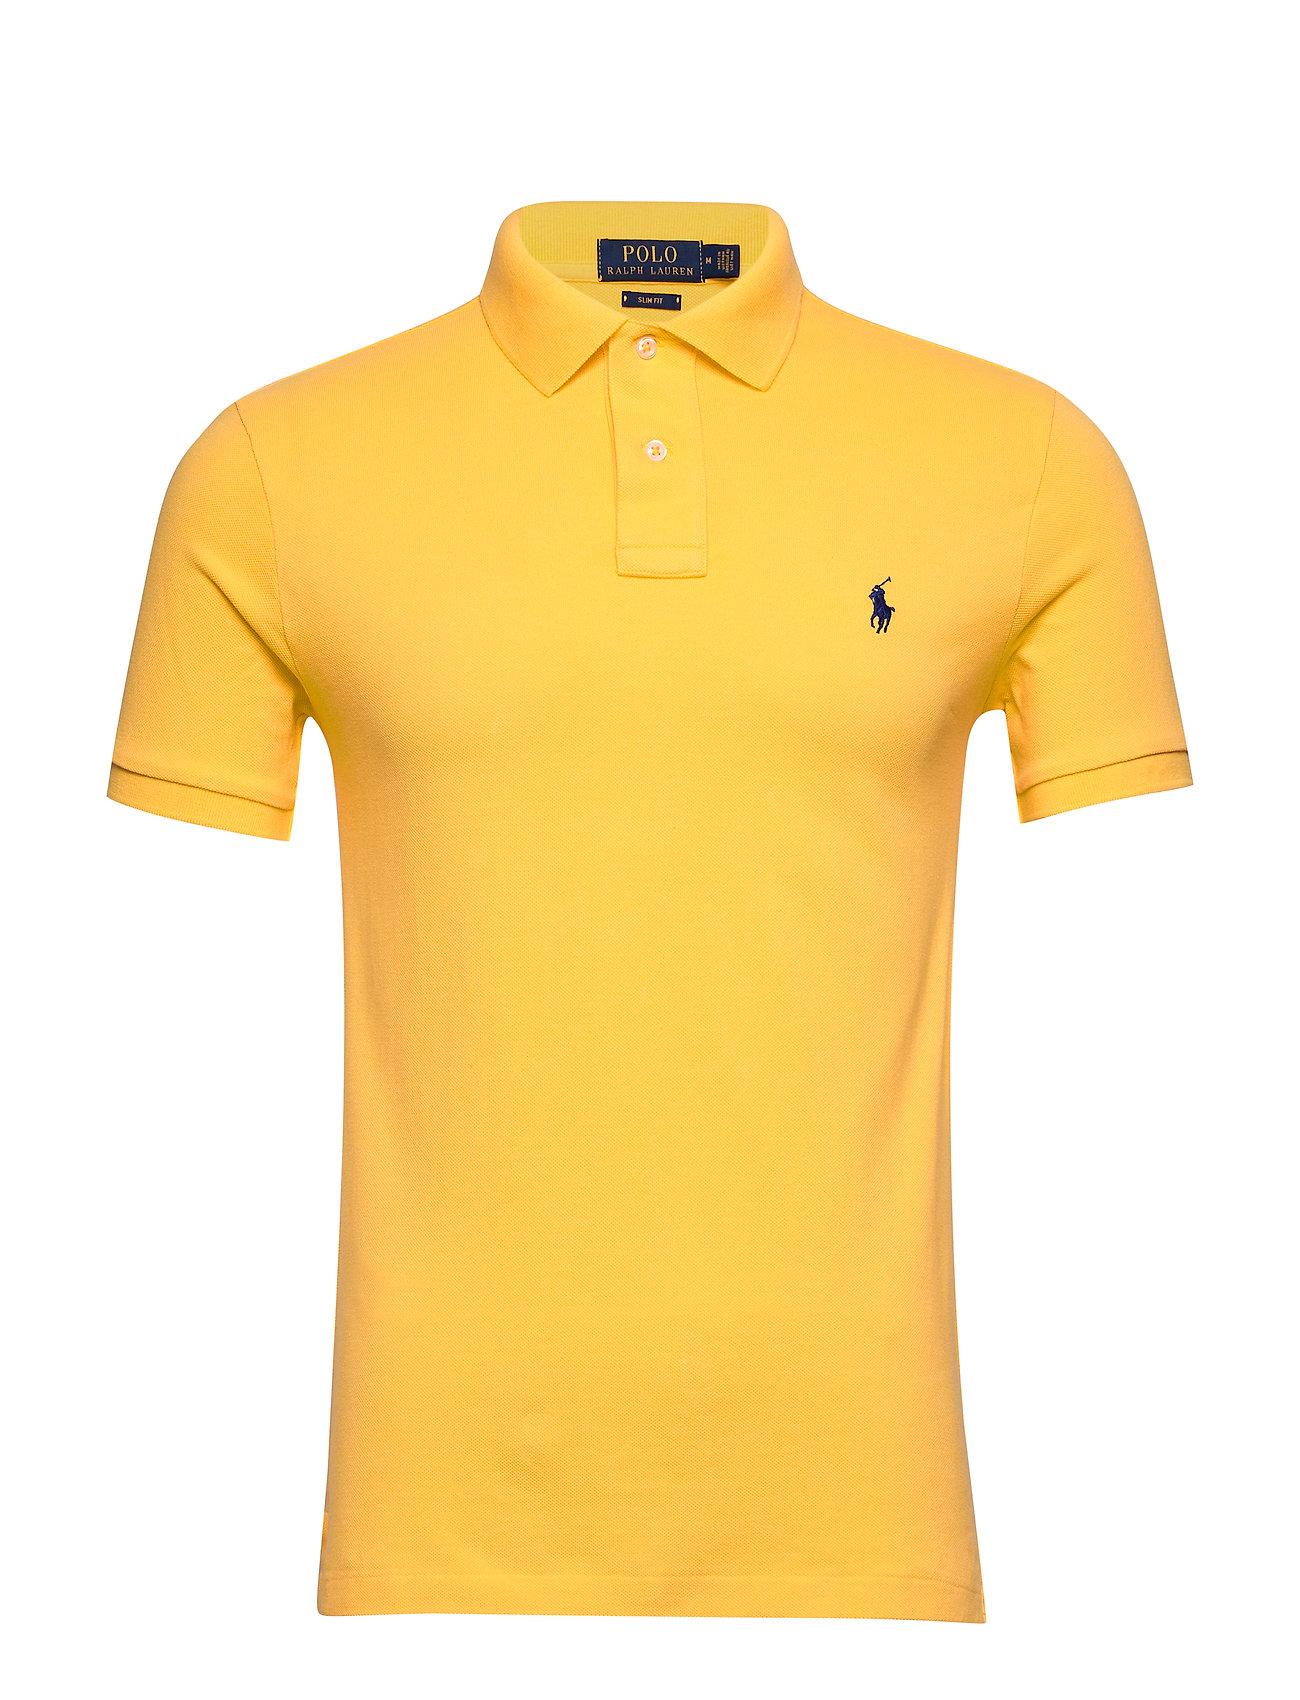 Polo Ralph Lauren Slim Fit Mesh Polo Shirt - YELLOWFIN/C7315